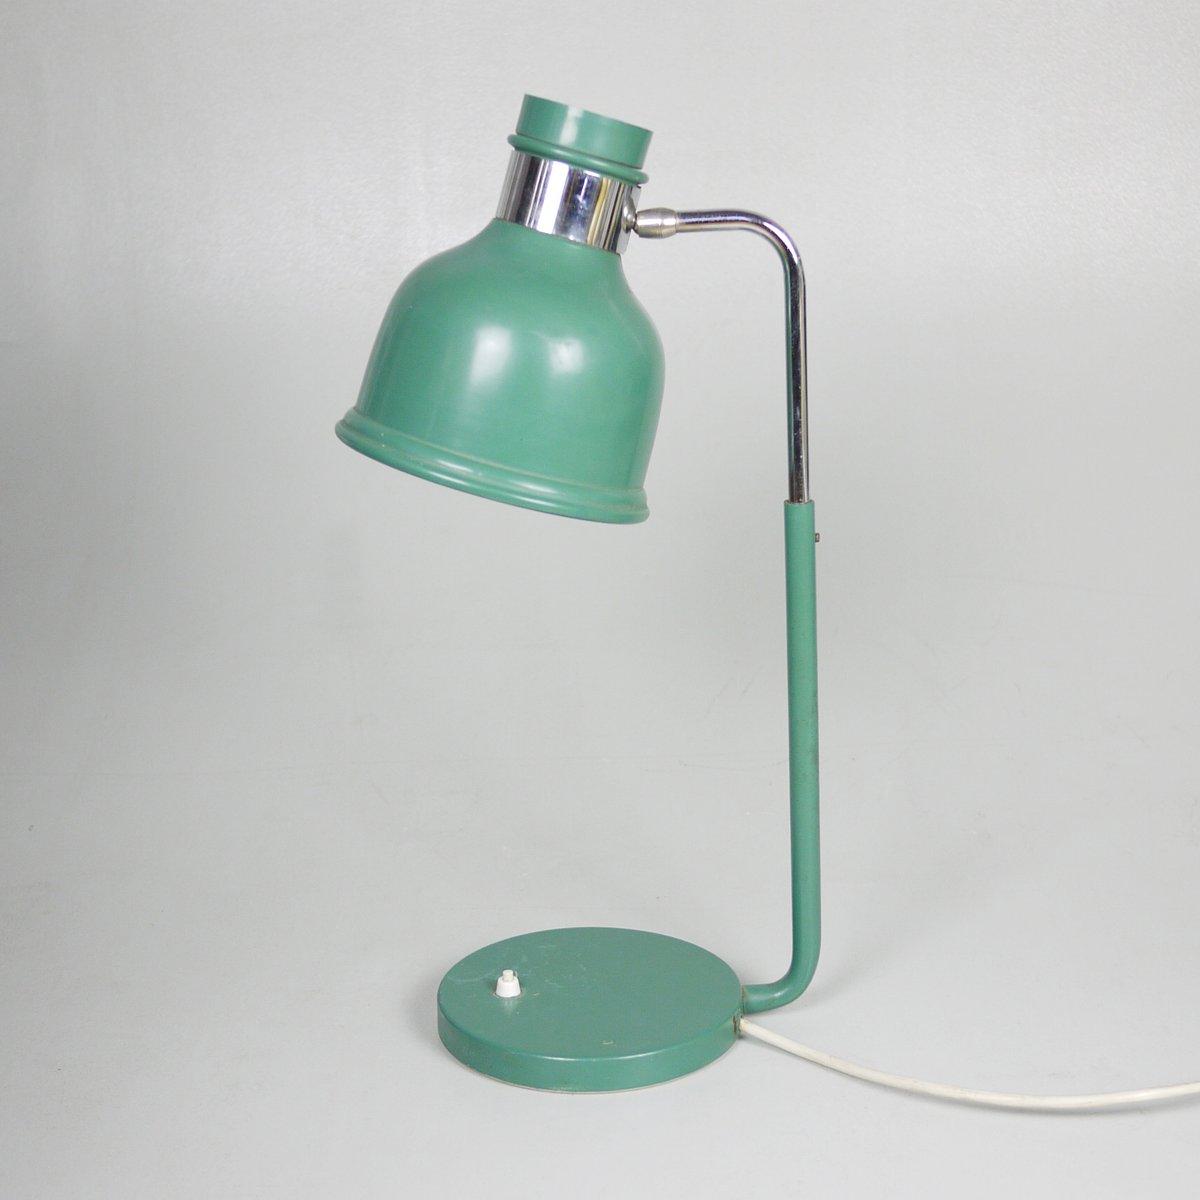 lampe de bureau vintage industrielle verte 1970s en vente. Black Bedroom Furniture Sets. Home Design Ideas